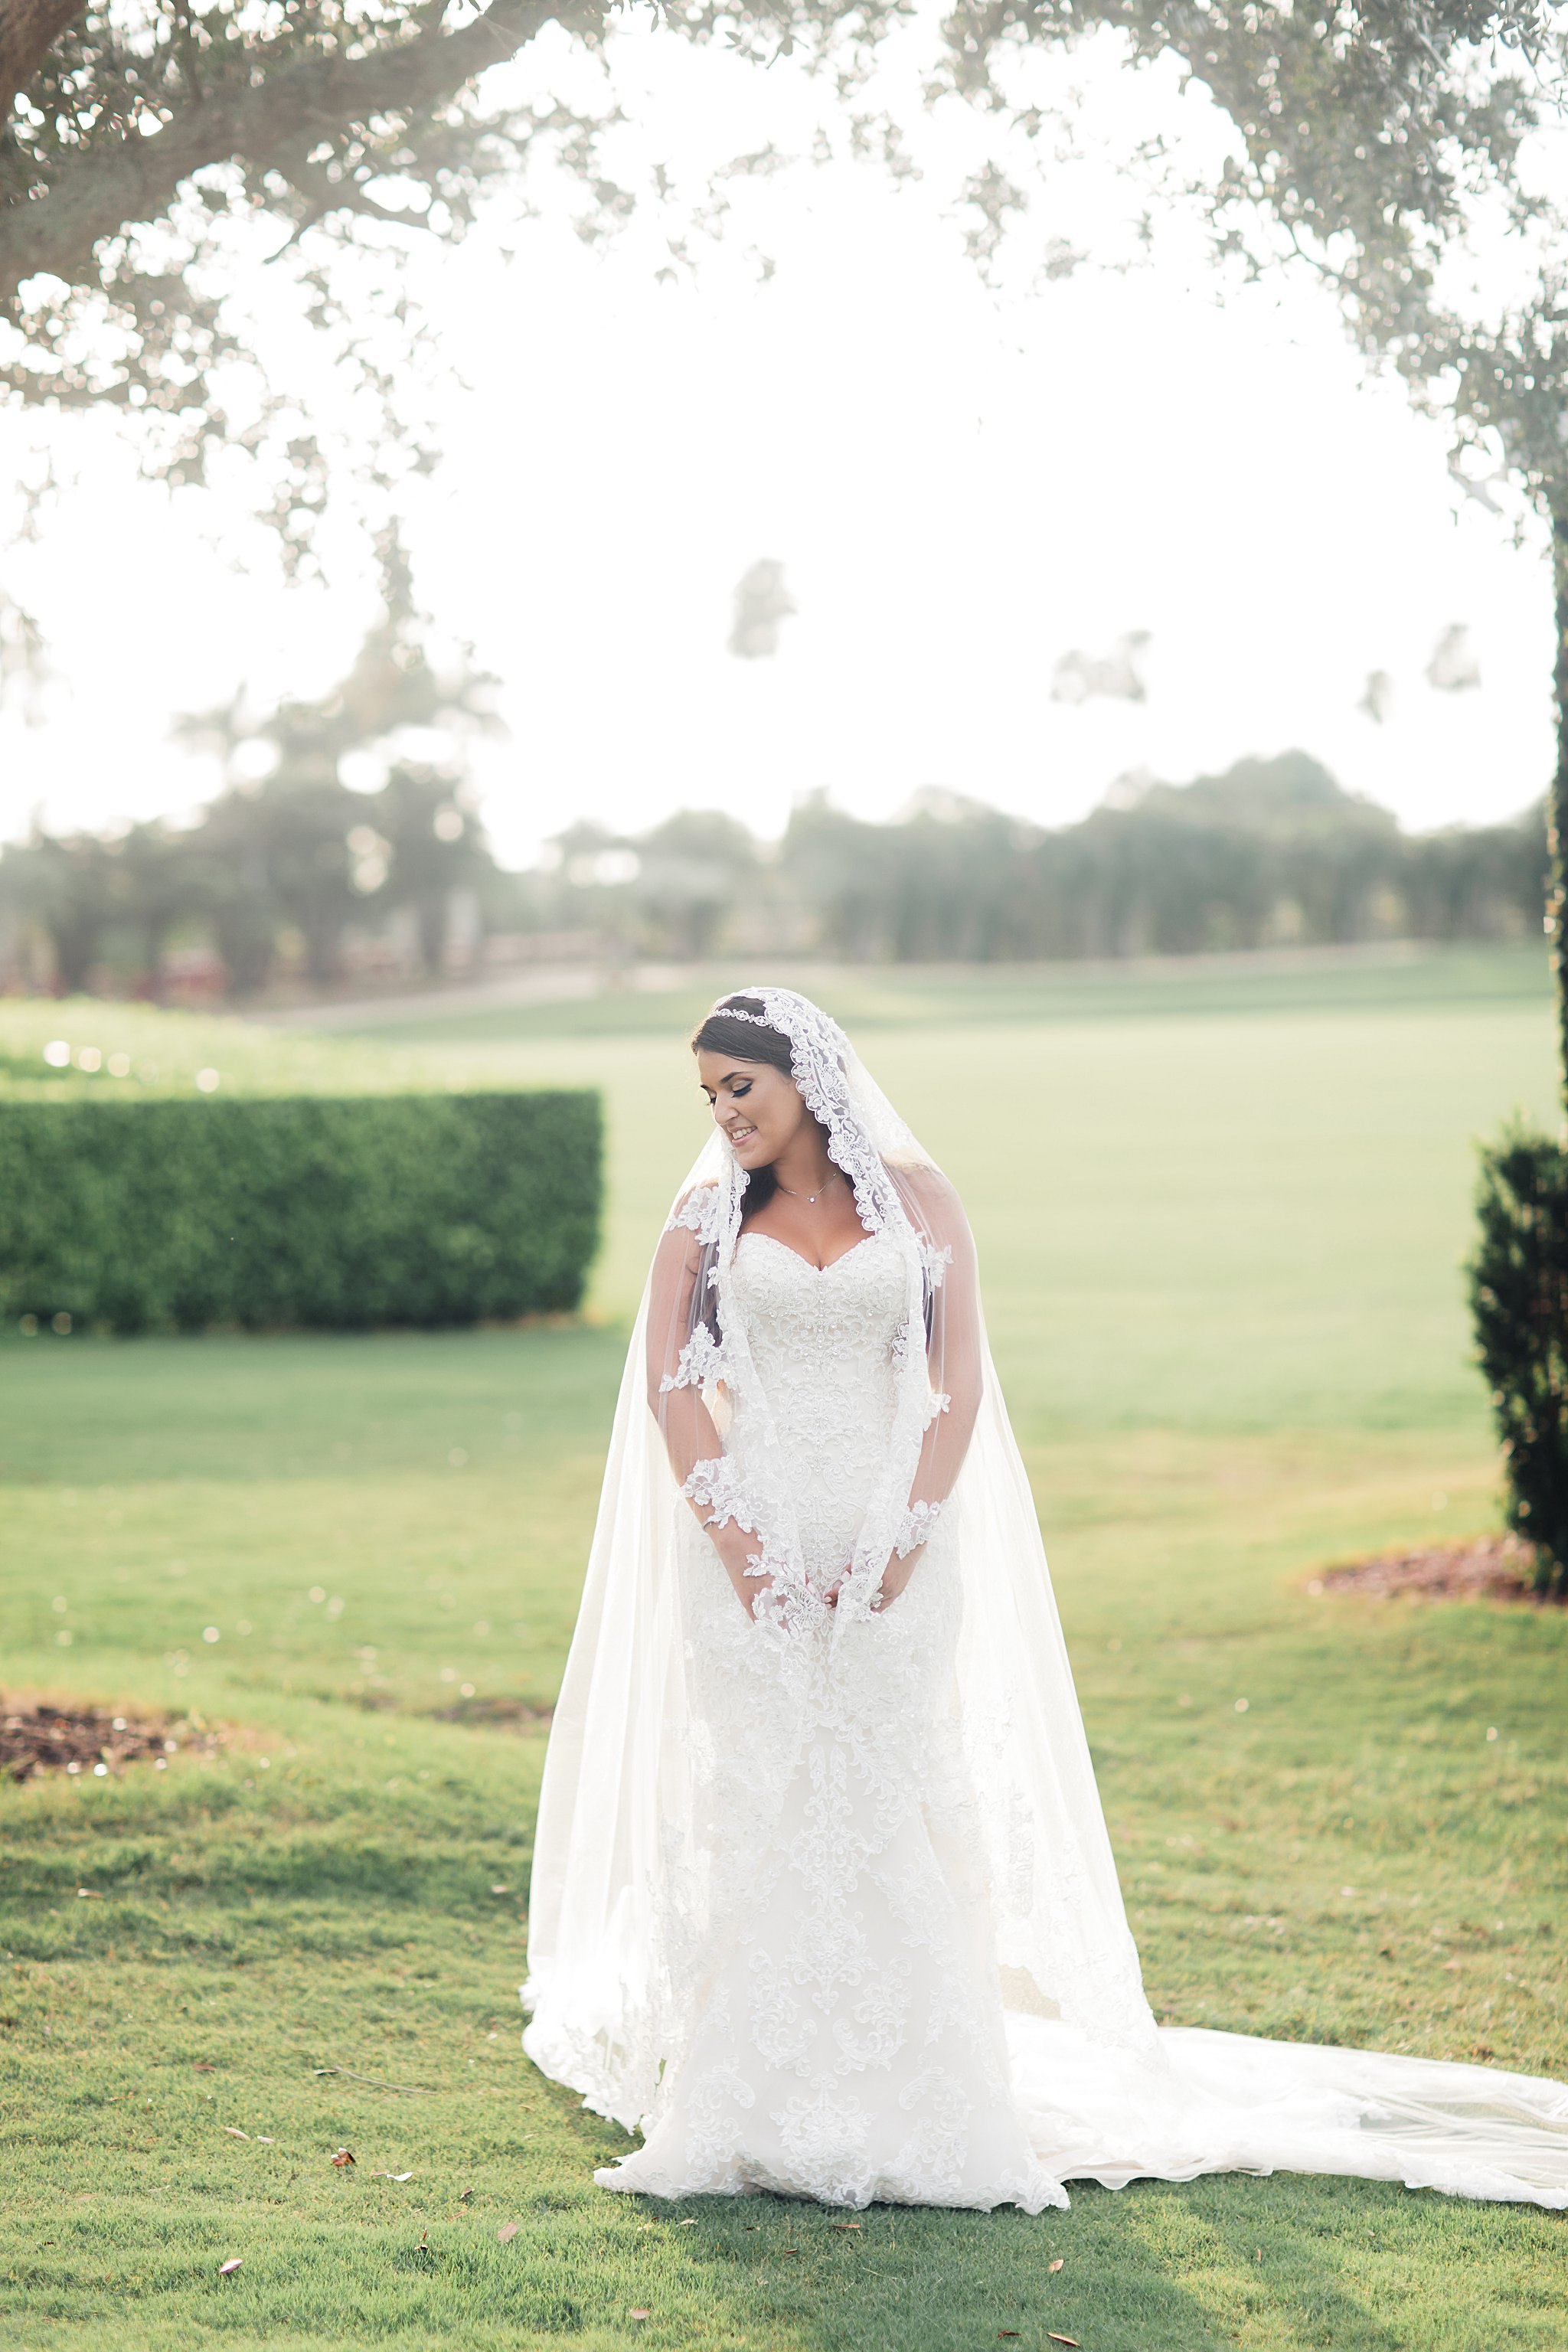 WeddingandEngagementFloridaPhotographer_2819.jpg